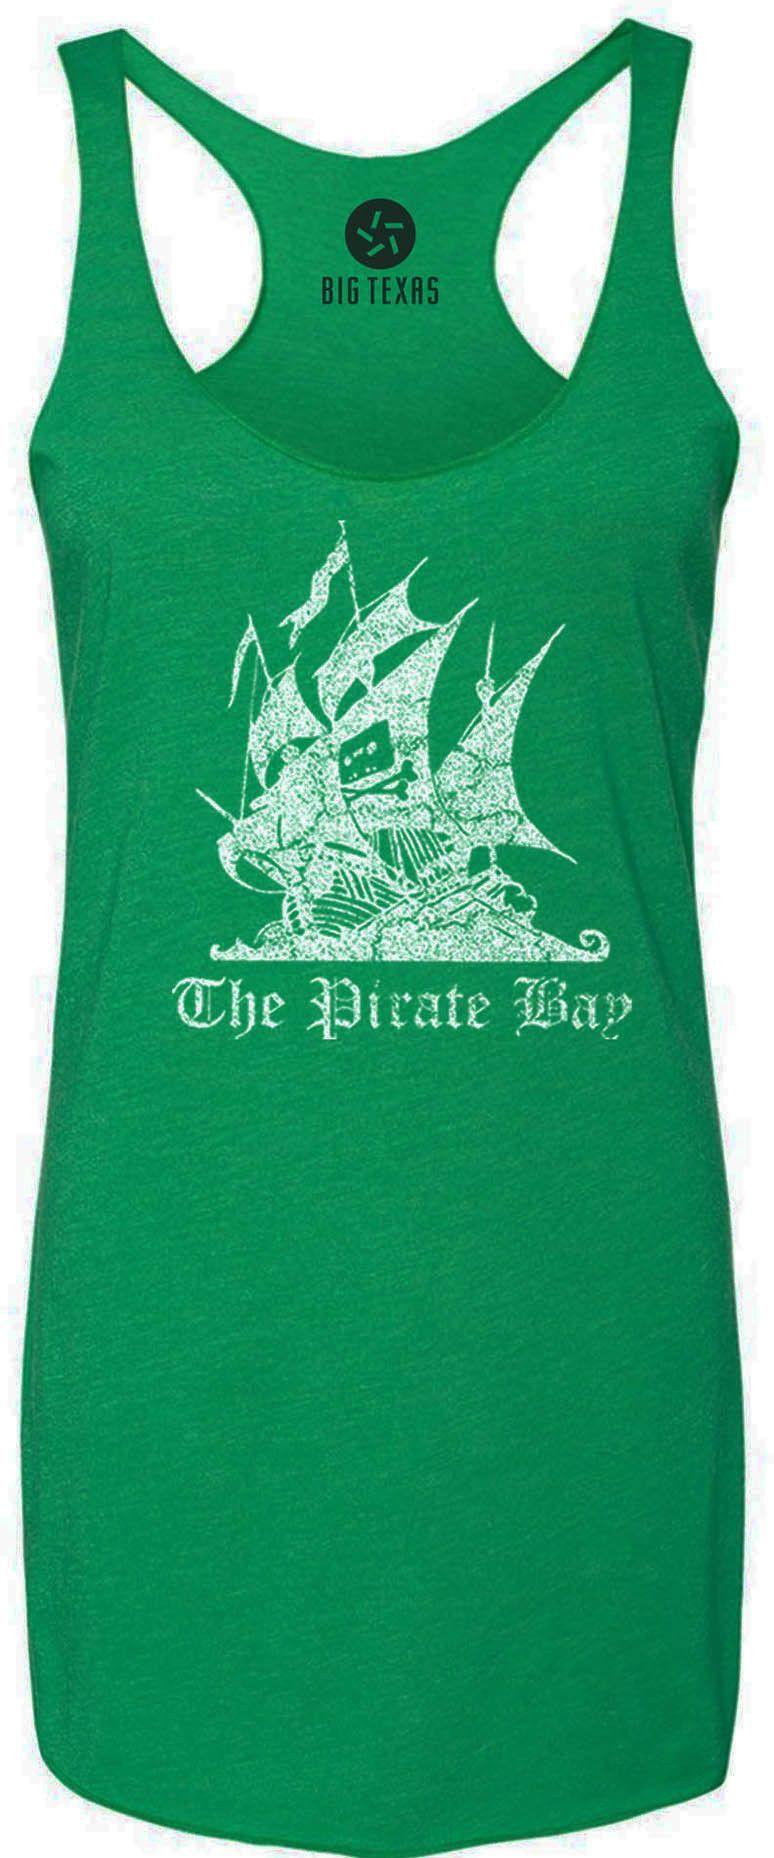 The Pirate Bay Distressed (White) Tri-Blend Racerback Tank-Top